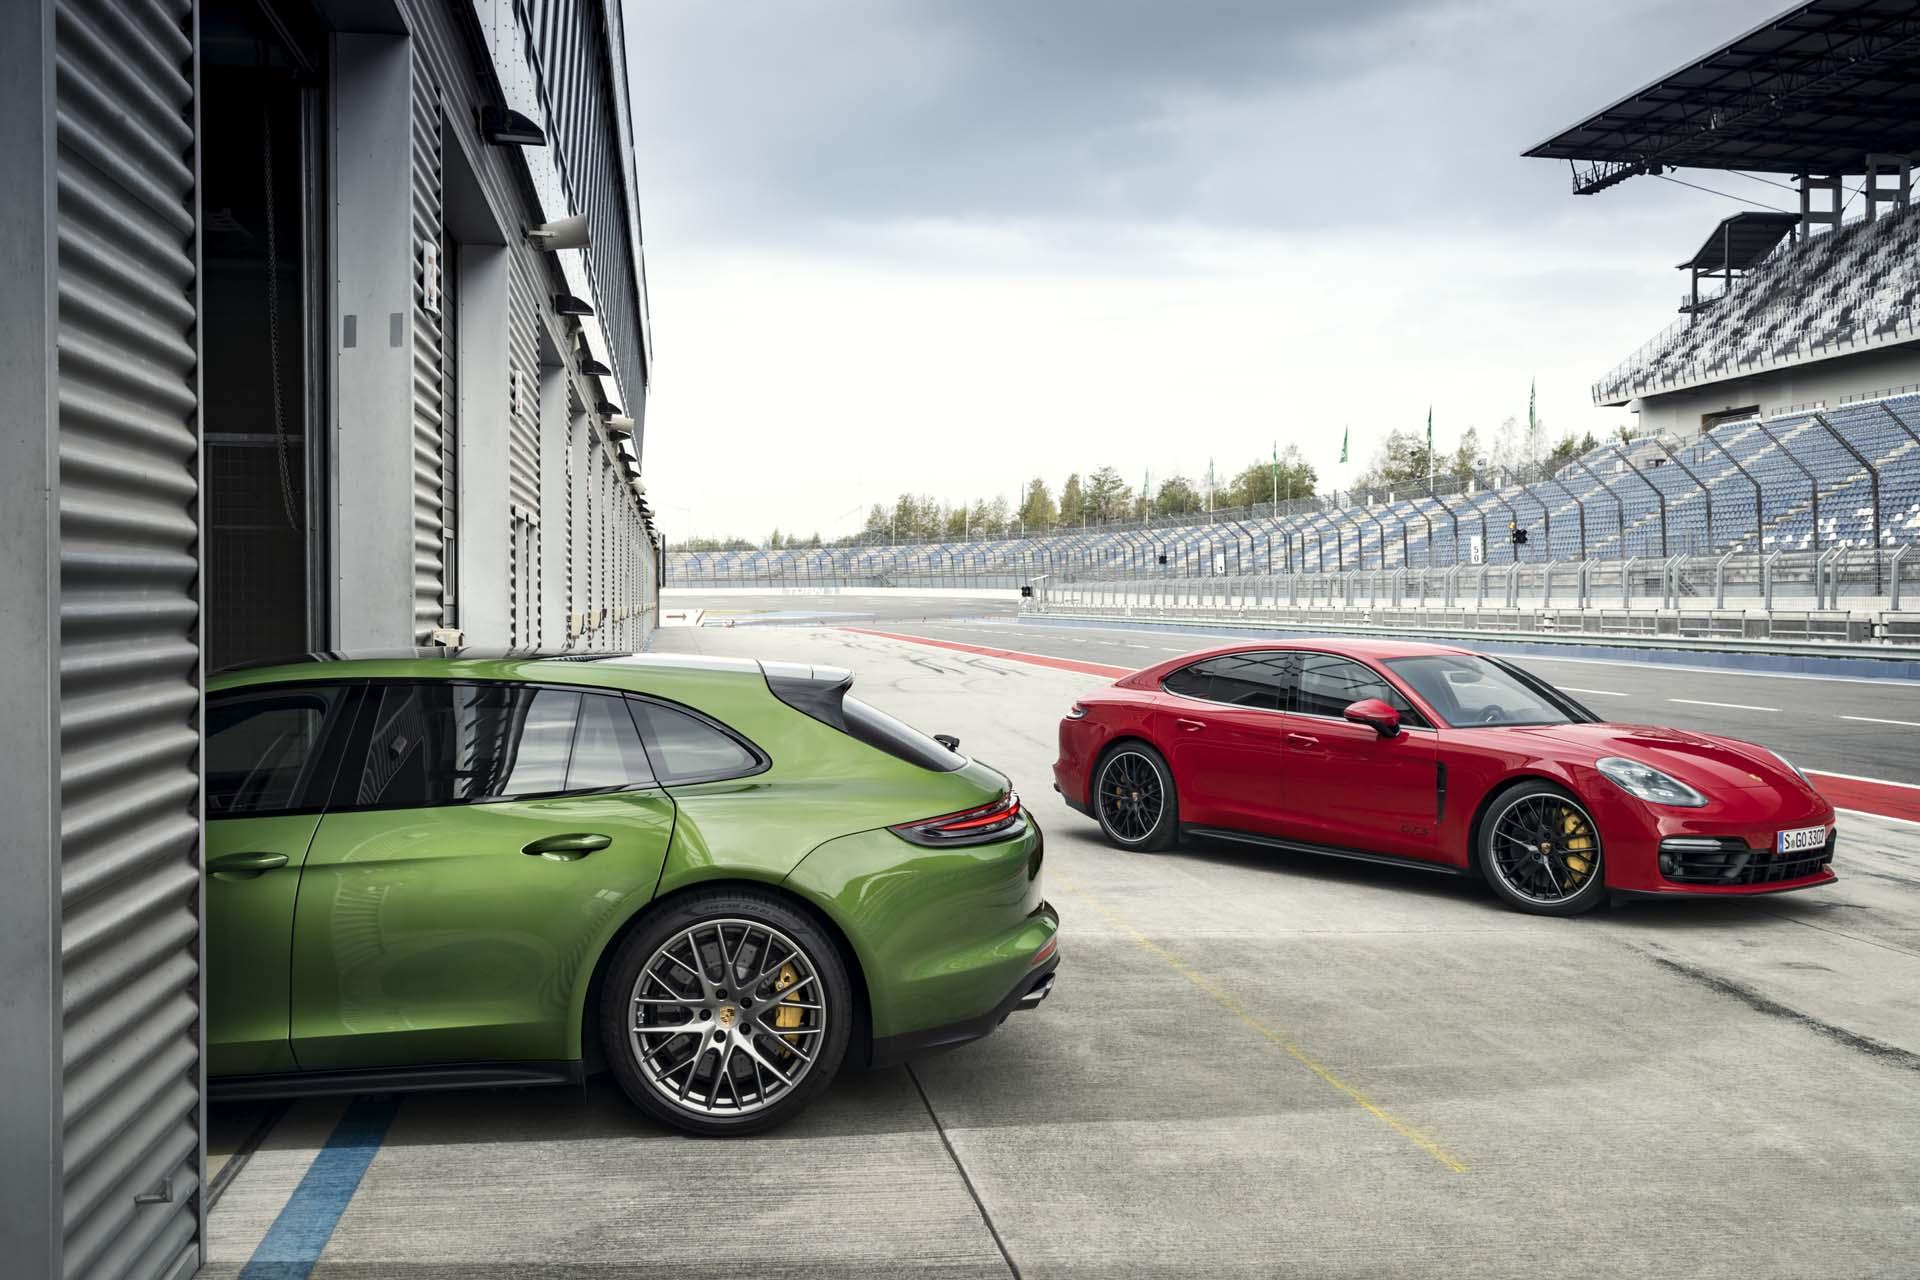 2019 Porsche Panamera Turbo, GTS, Price, And Redesign >> Meet The New Sweet Spot 2019 Porsche Panamera Gts Debuts